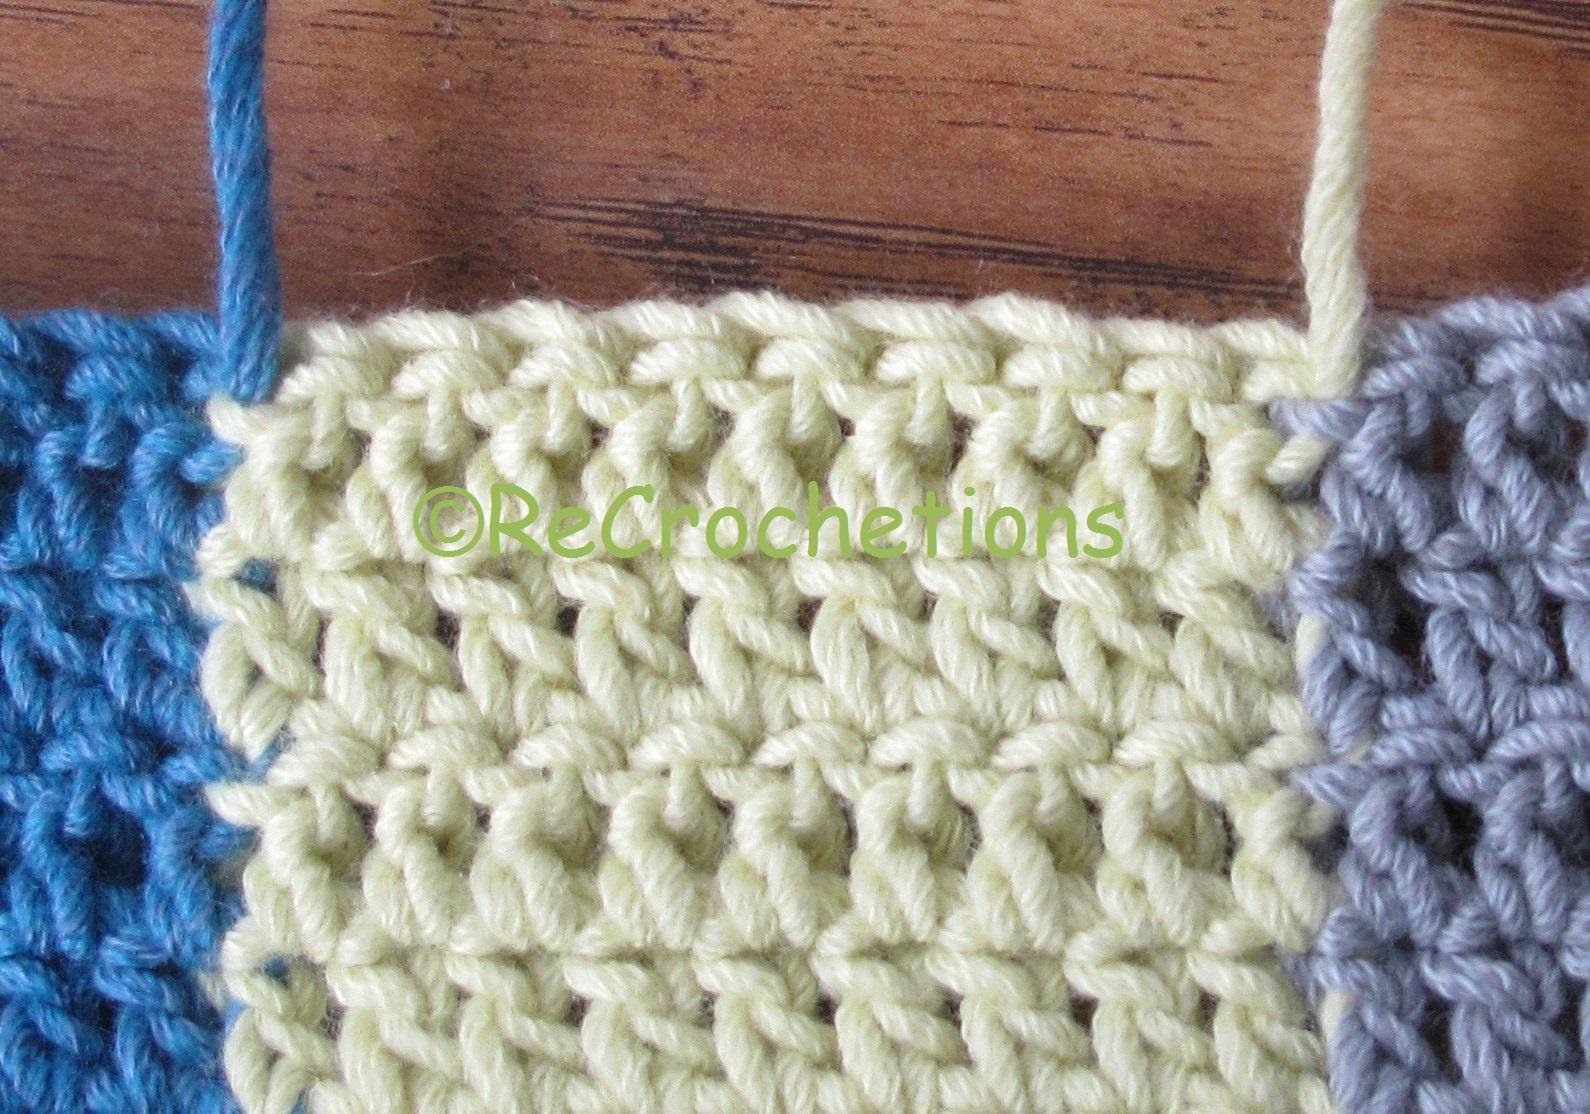 Intarsia Crochet Pattern Maker : ReCrochetions: Reversible Intarsia: Half Double Crochet ...